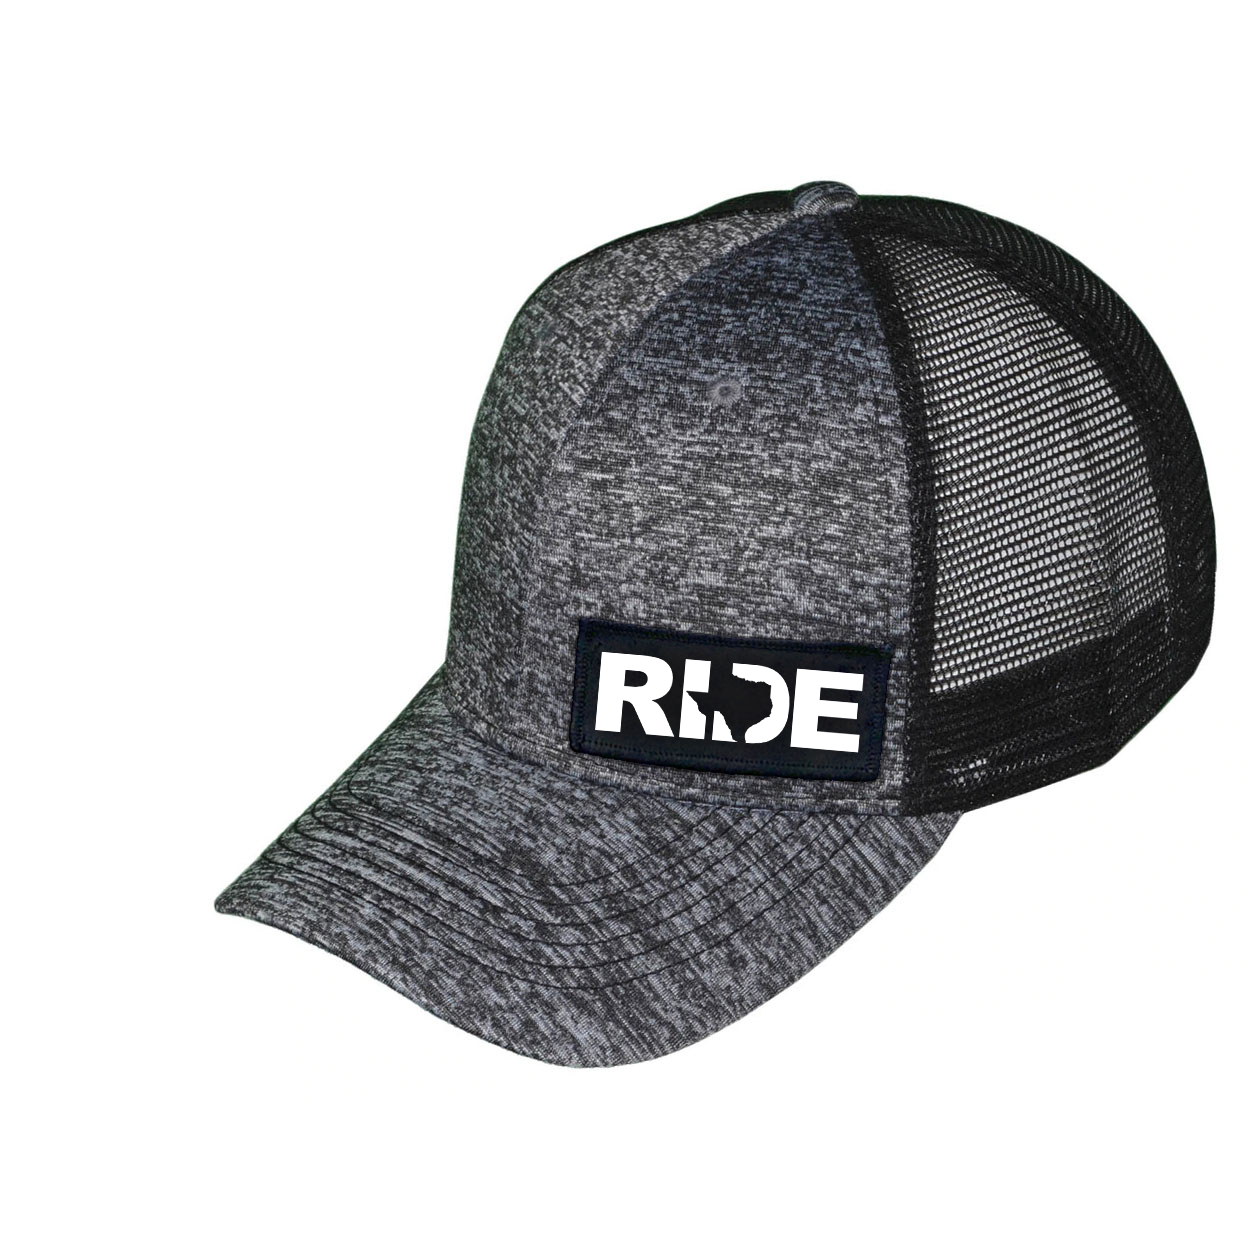 Ride Texas Night Out Woven Patch Melange Snapback Trucker Hat Gray/Black (White Logo)